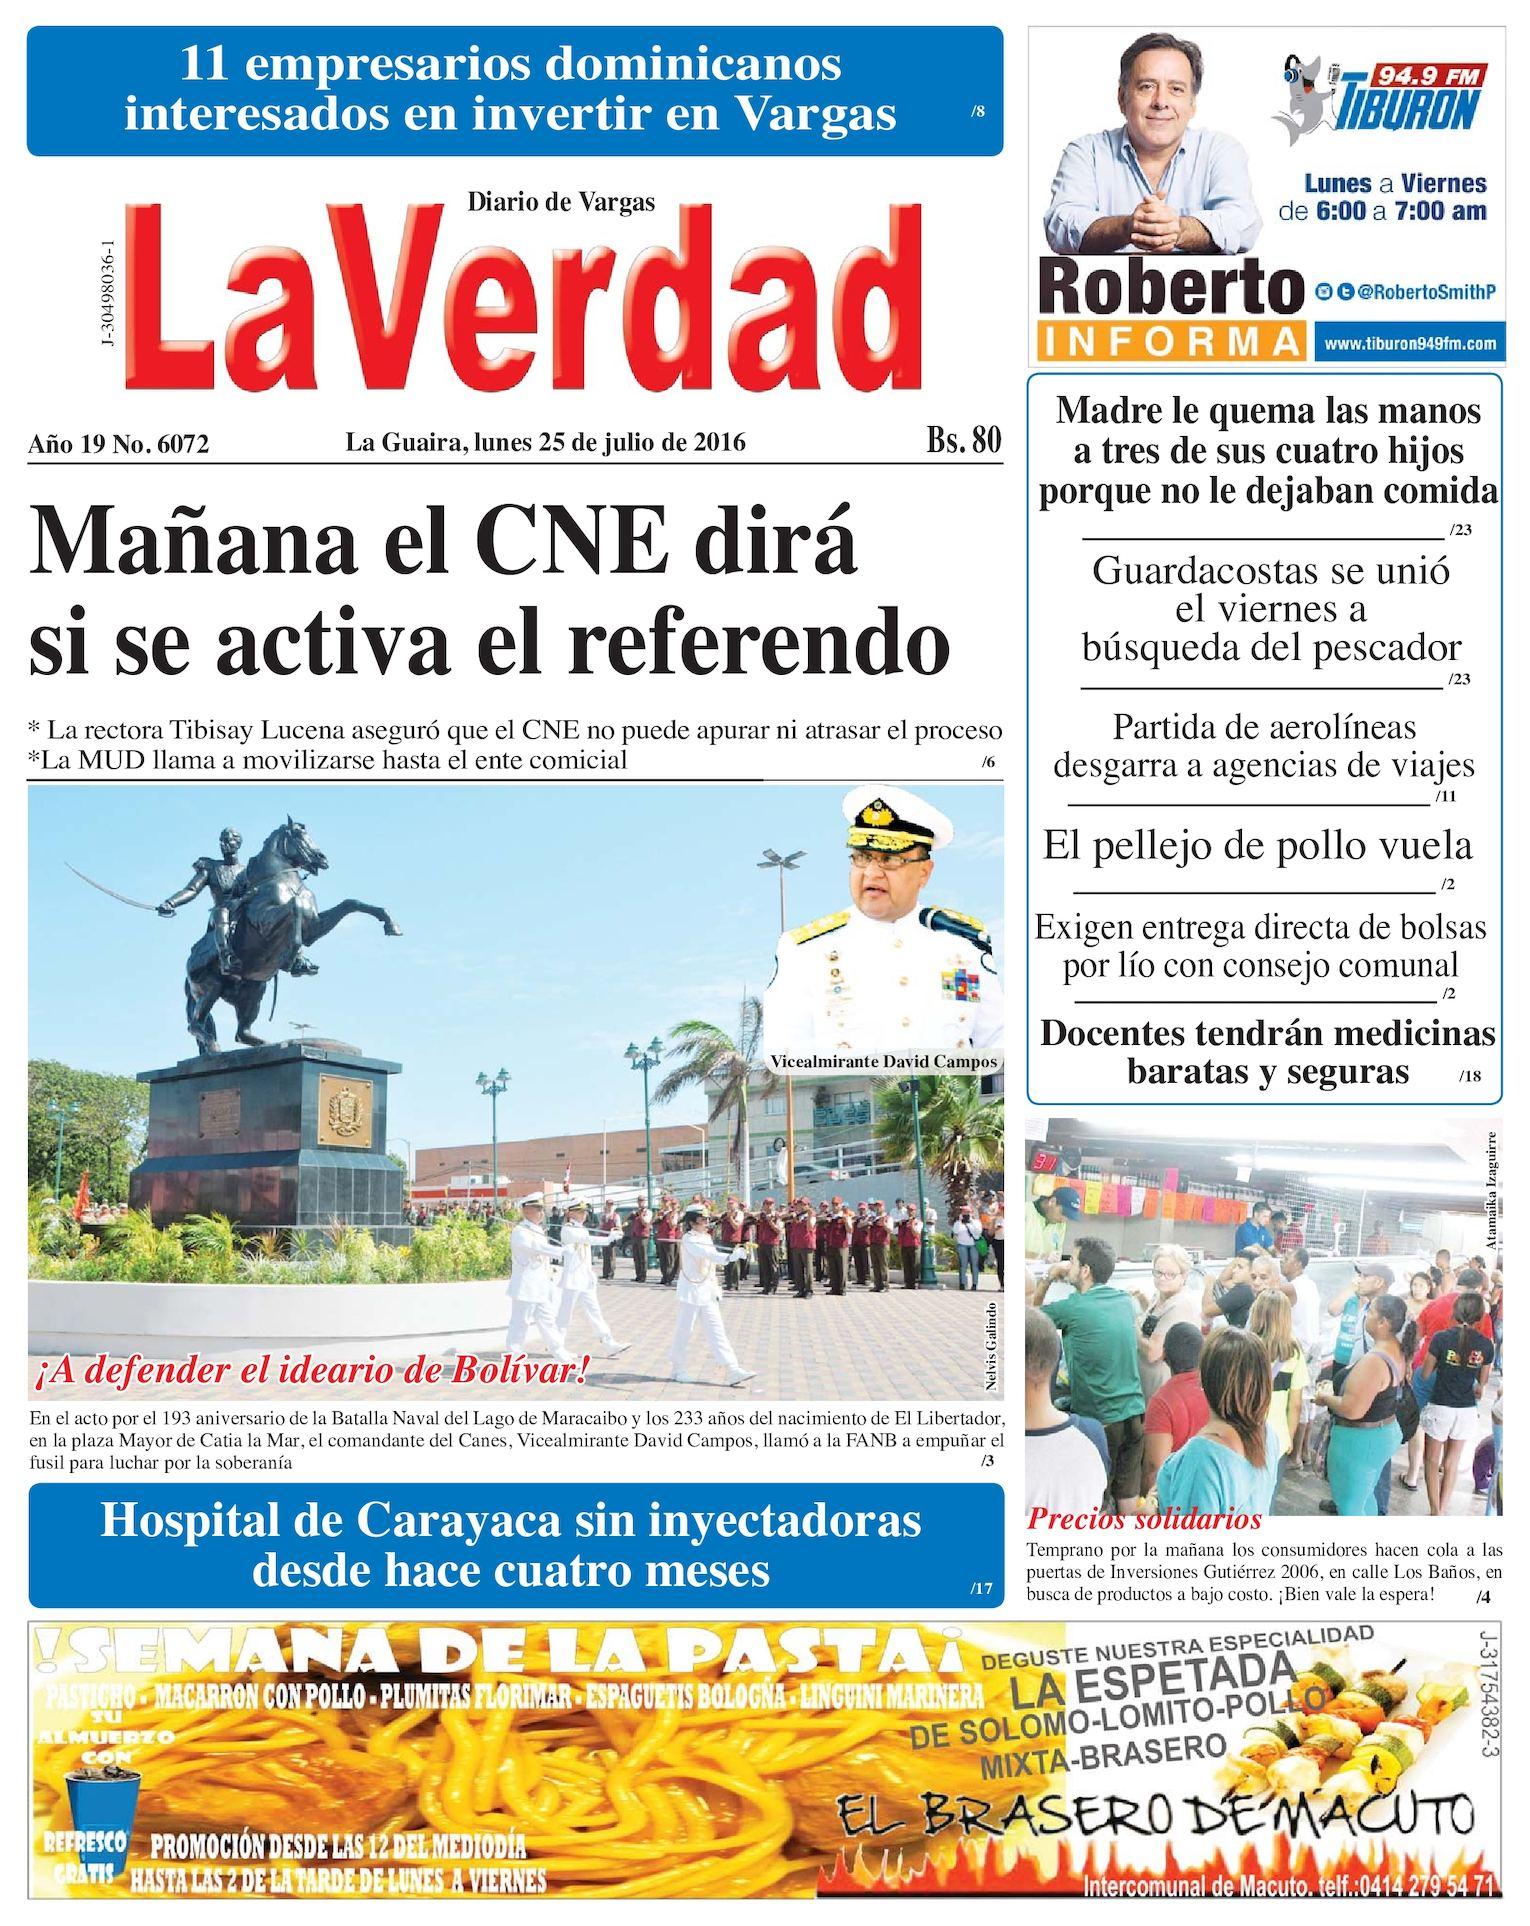 Calaméo - La Guaira, lunes 25 de julio de 2016 Año 19 Nº. 6072